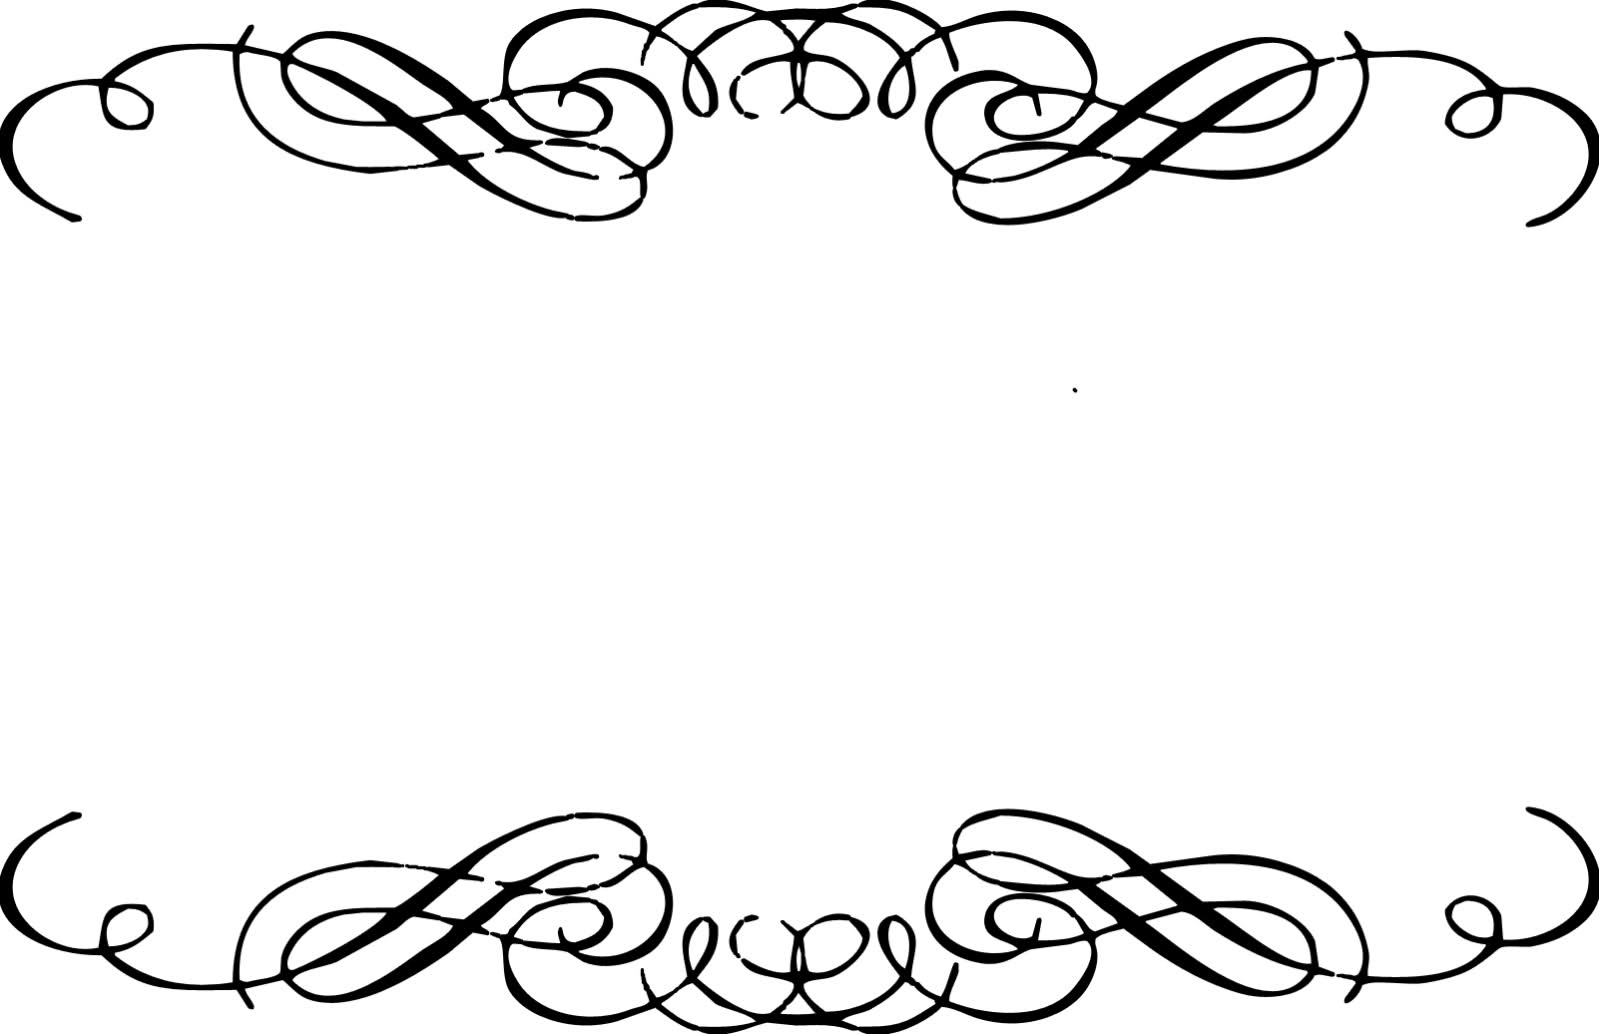 Decorative Scroll Clip Art - .-Decorative Scroll Clip Art - .-13